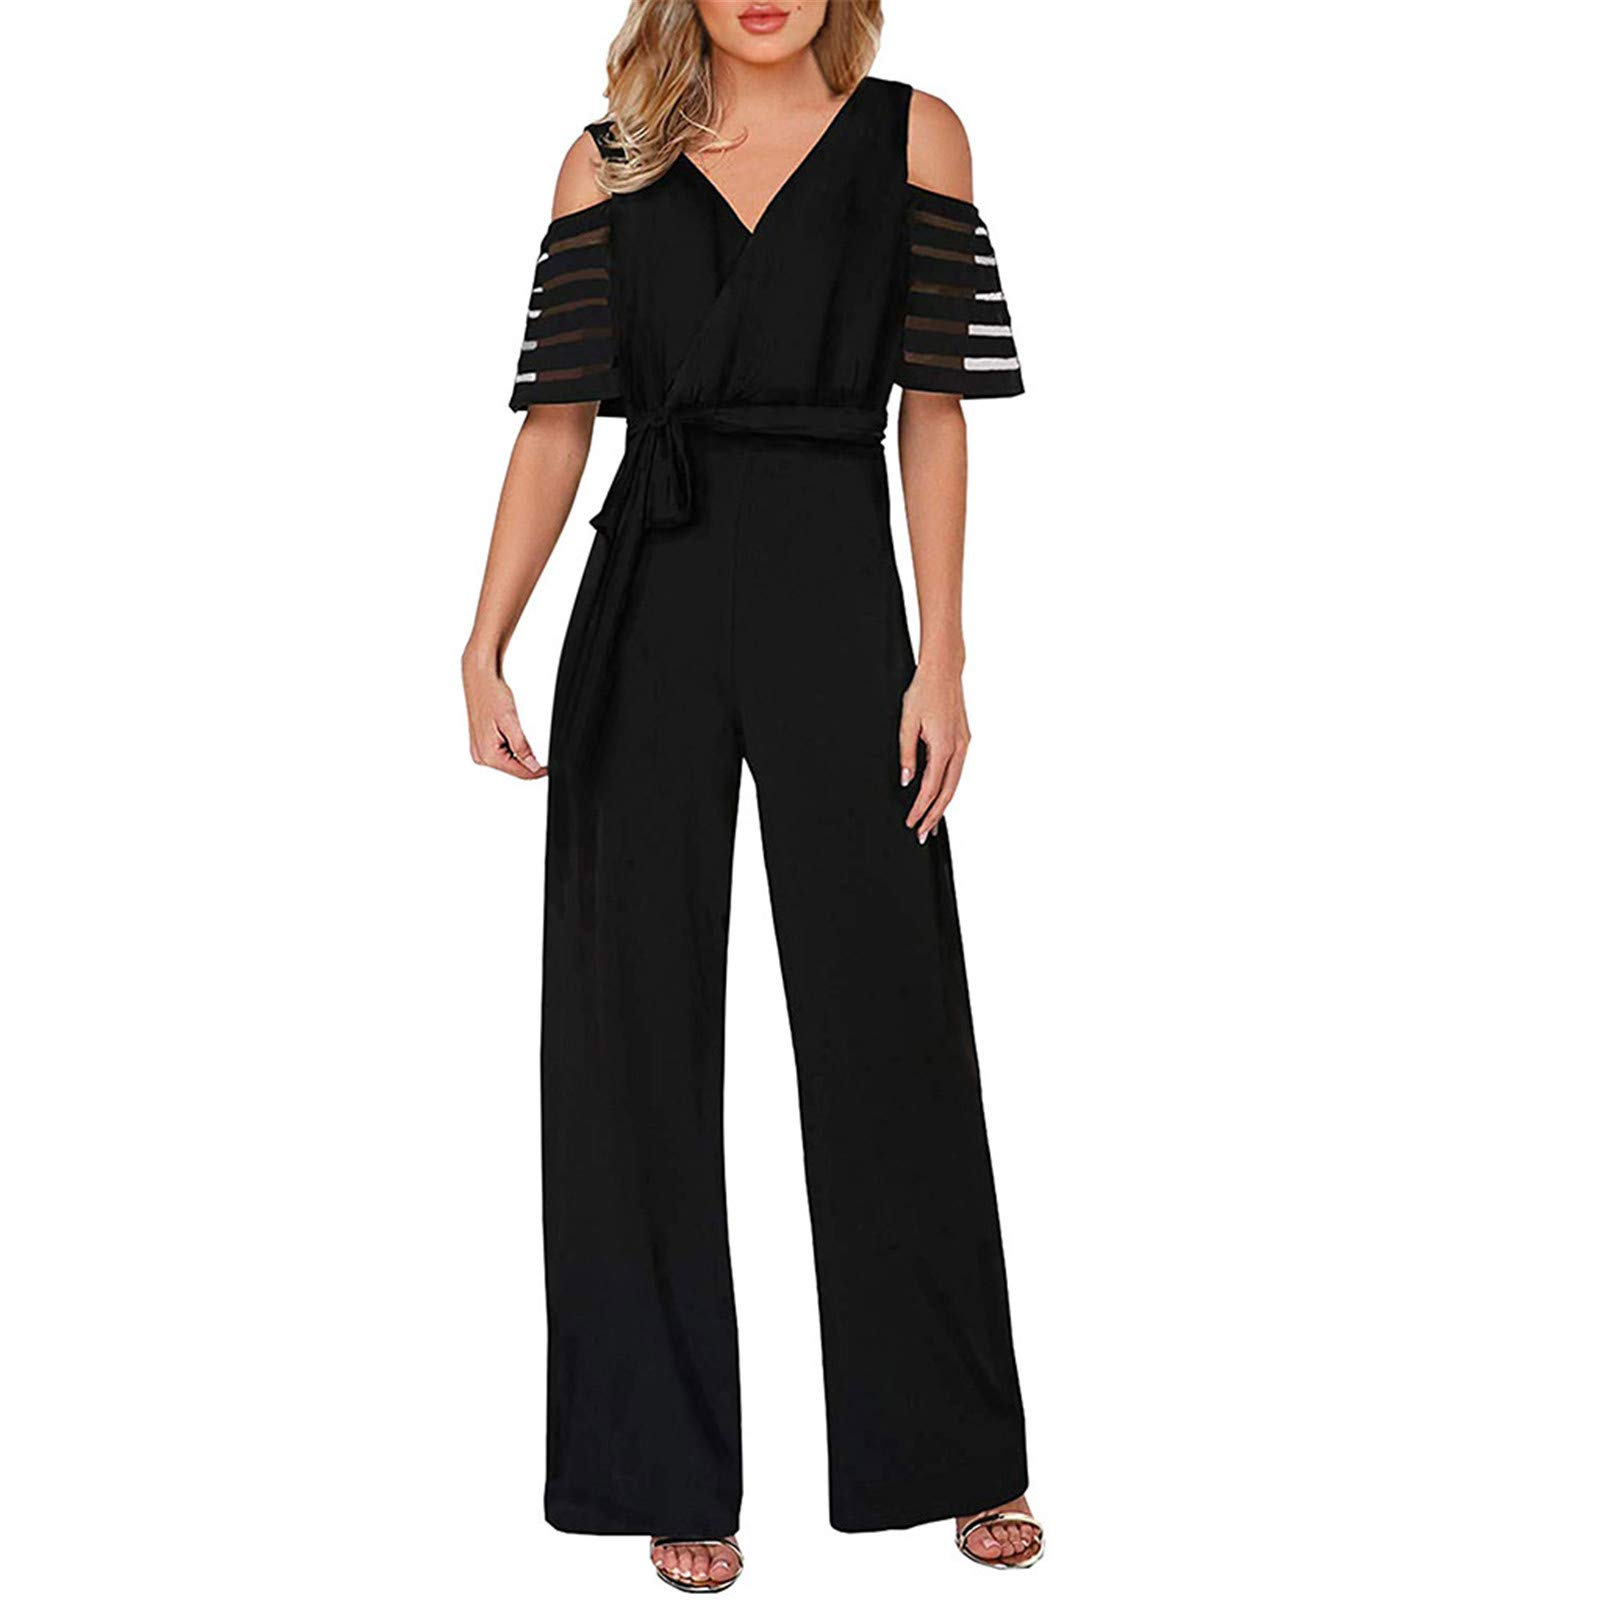 Thenxin Office Lady Jumpsuit V Neck Cold Shoulder High Waist Wide Leg Long Romper with Belt(Black,S)